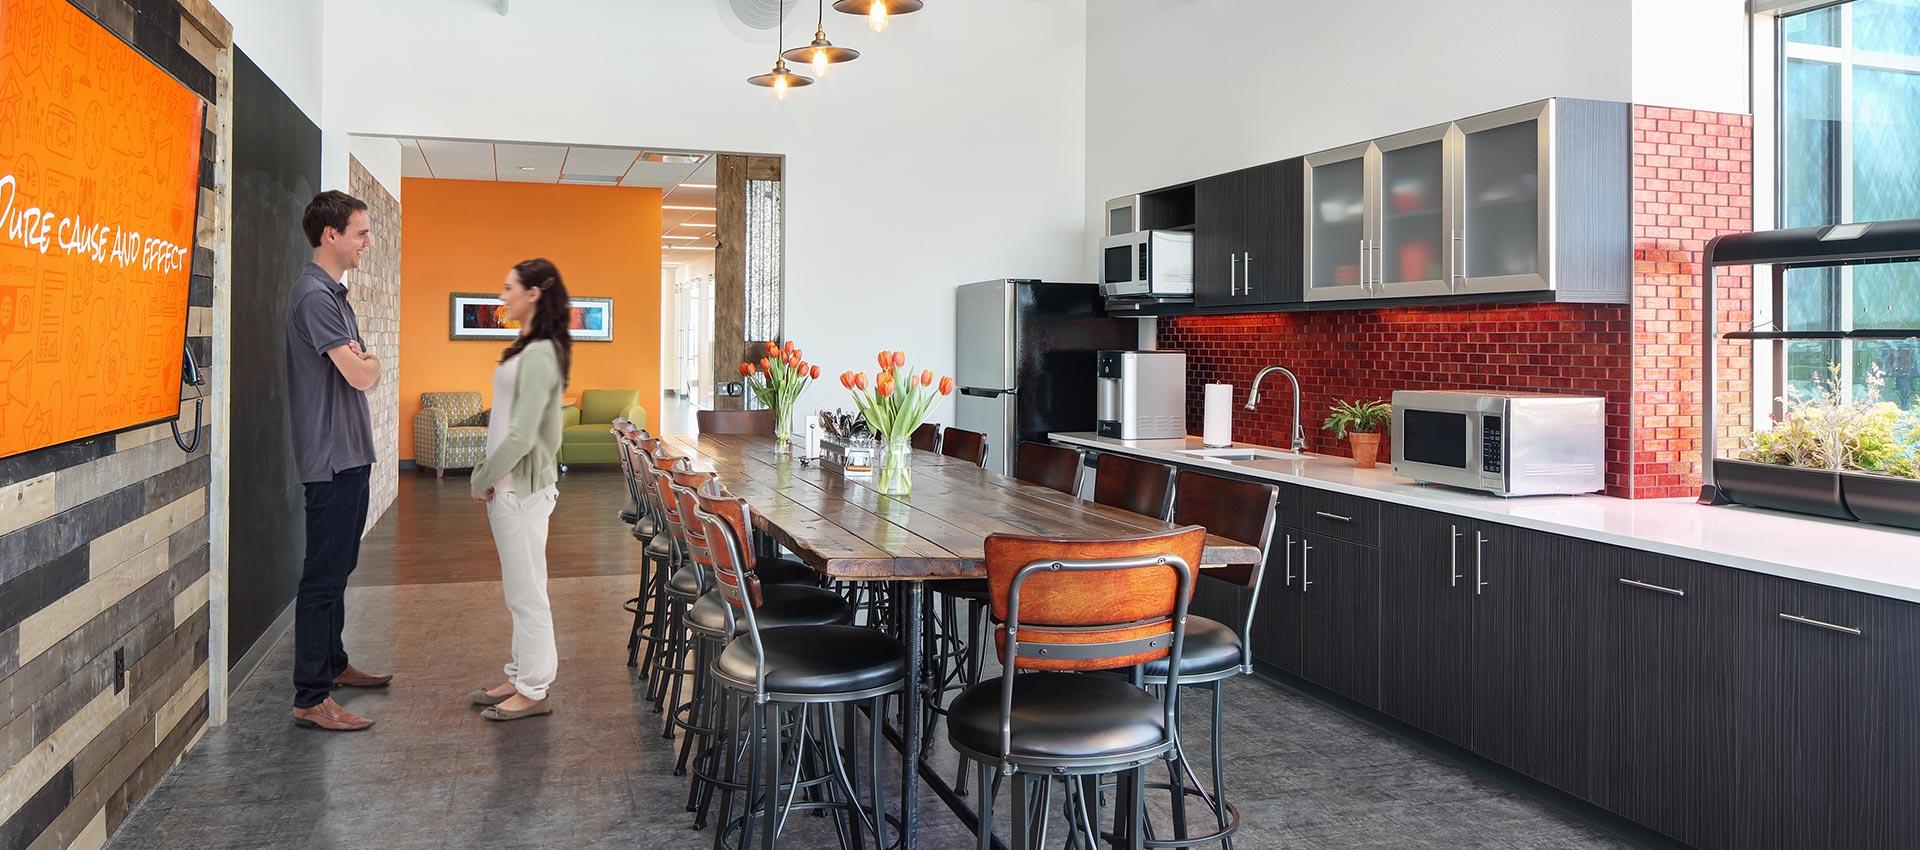 warm welcoming office design trends